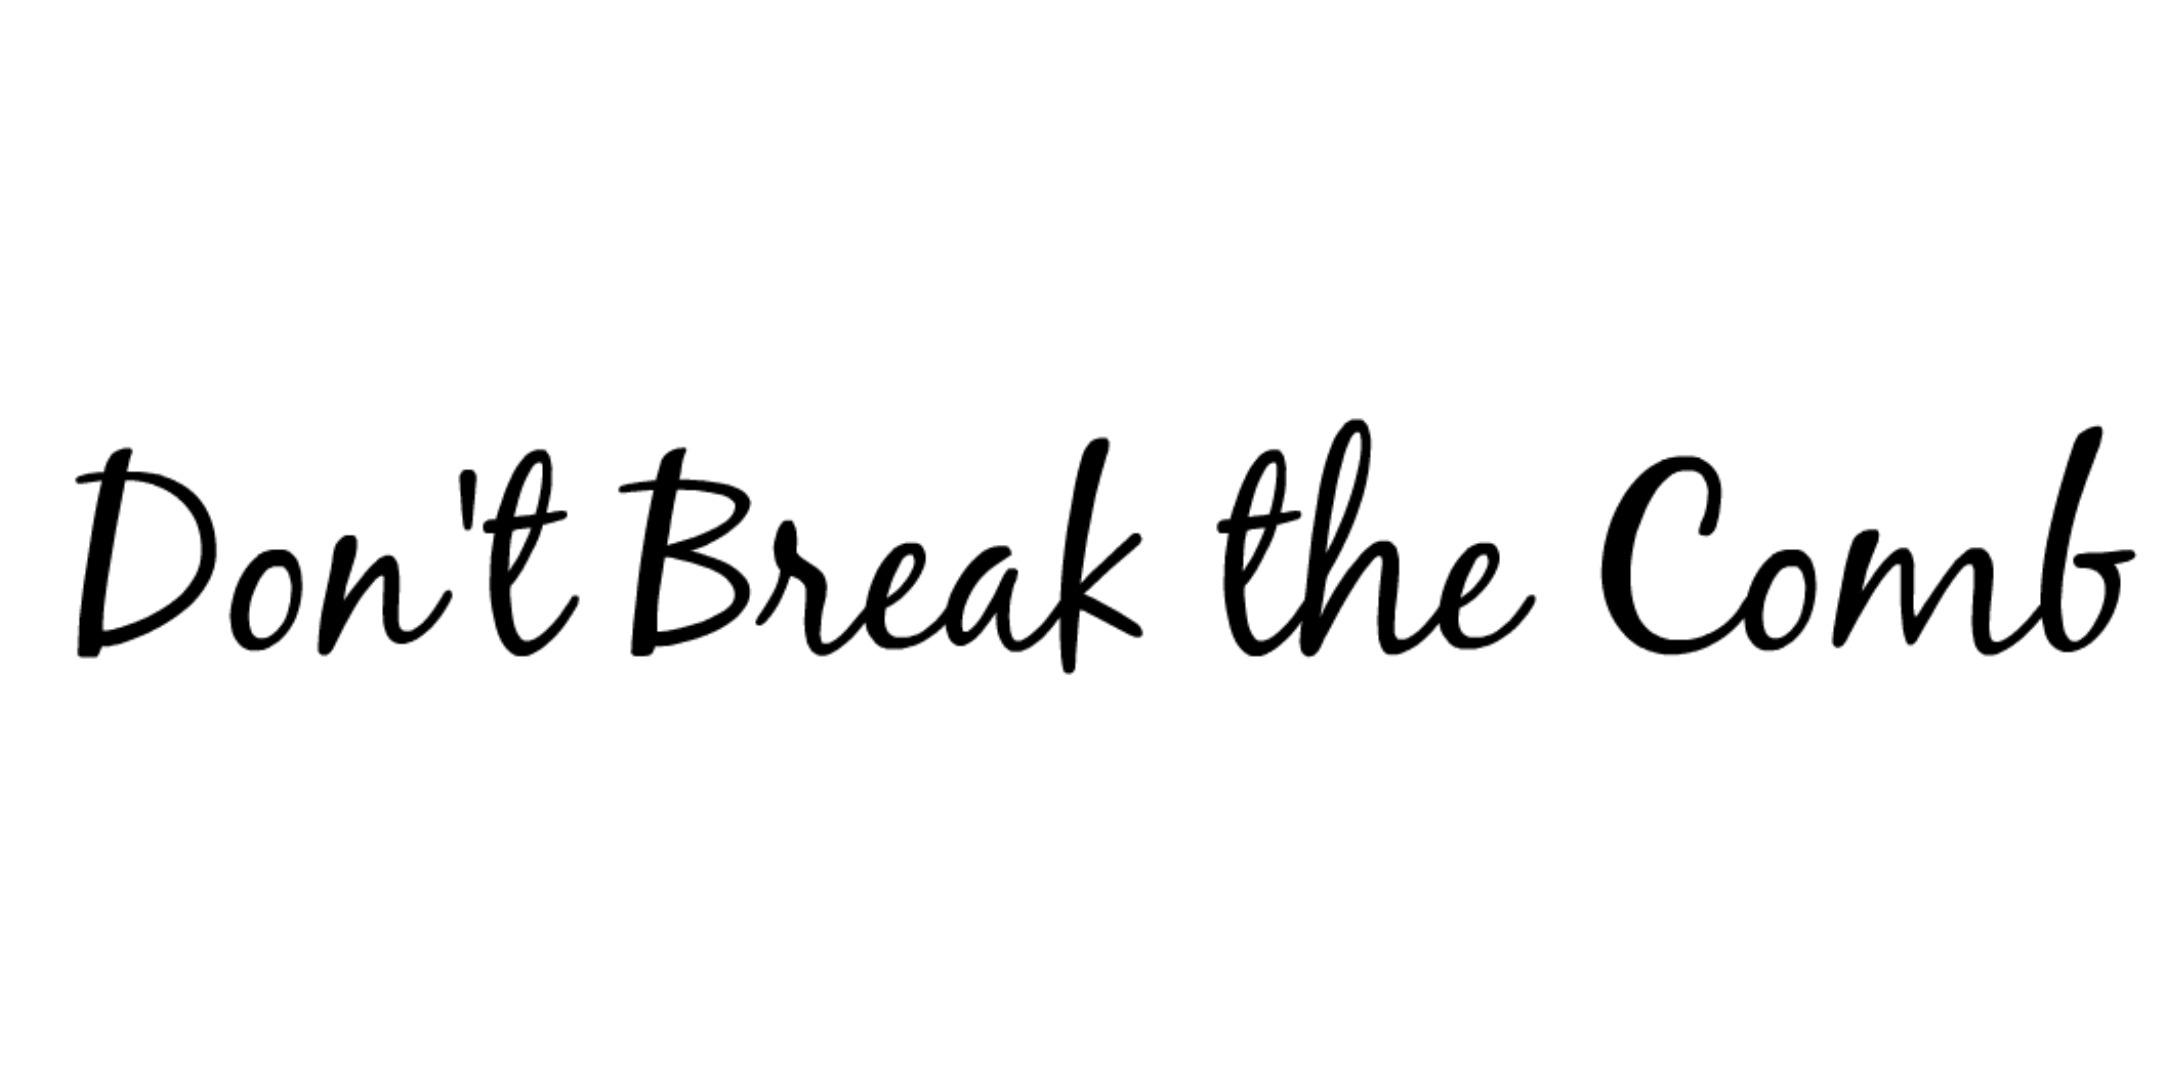 Don't Break the Comb